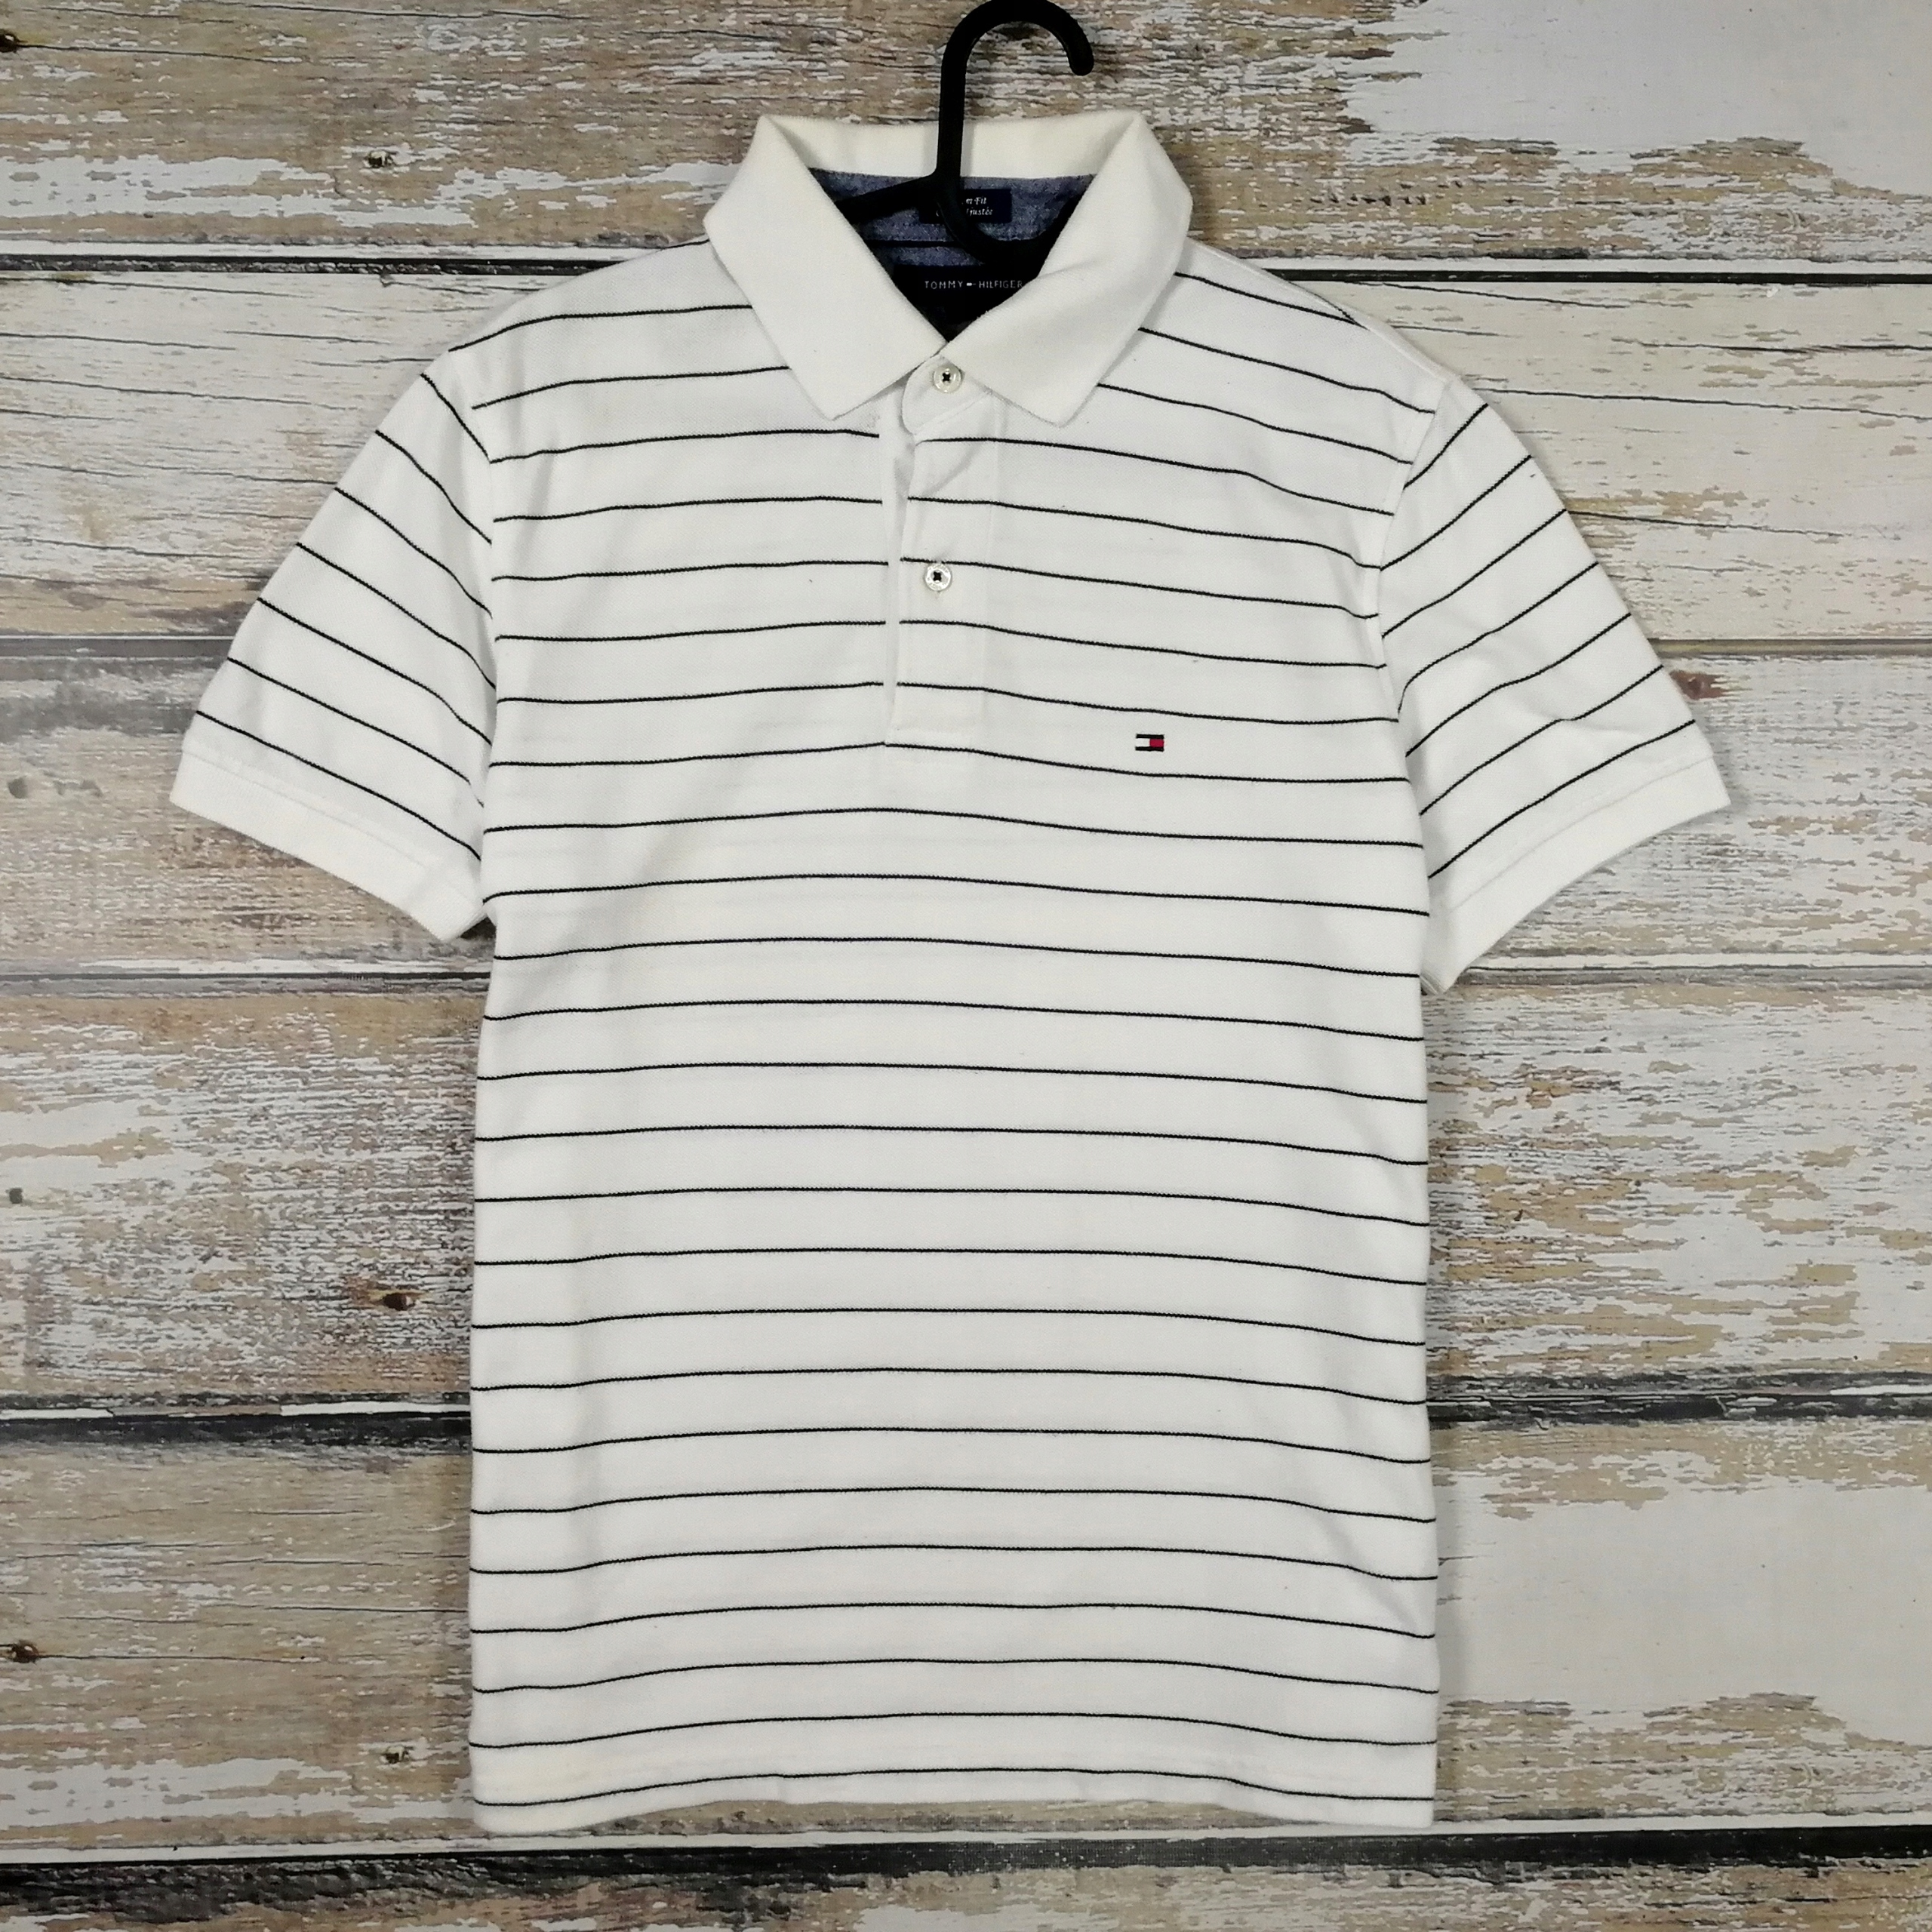 TOMMY HILFIGER Koszulka Polo Paski Stripe Balencia